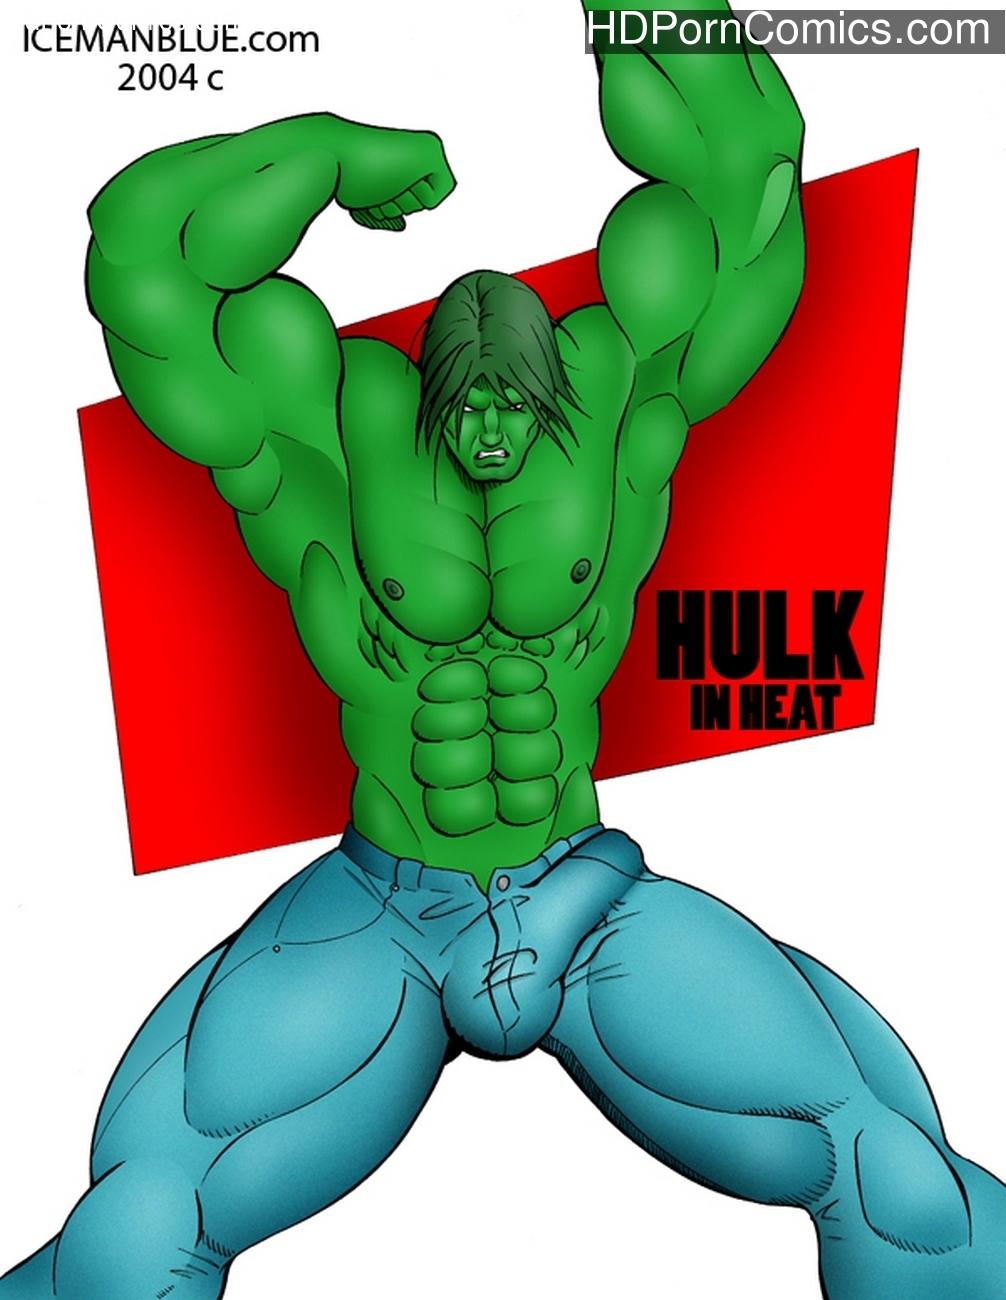 Hulk In Heat 1 free sex comic